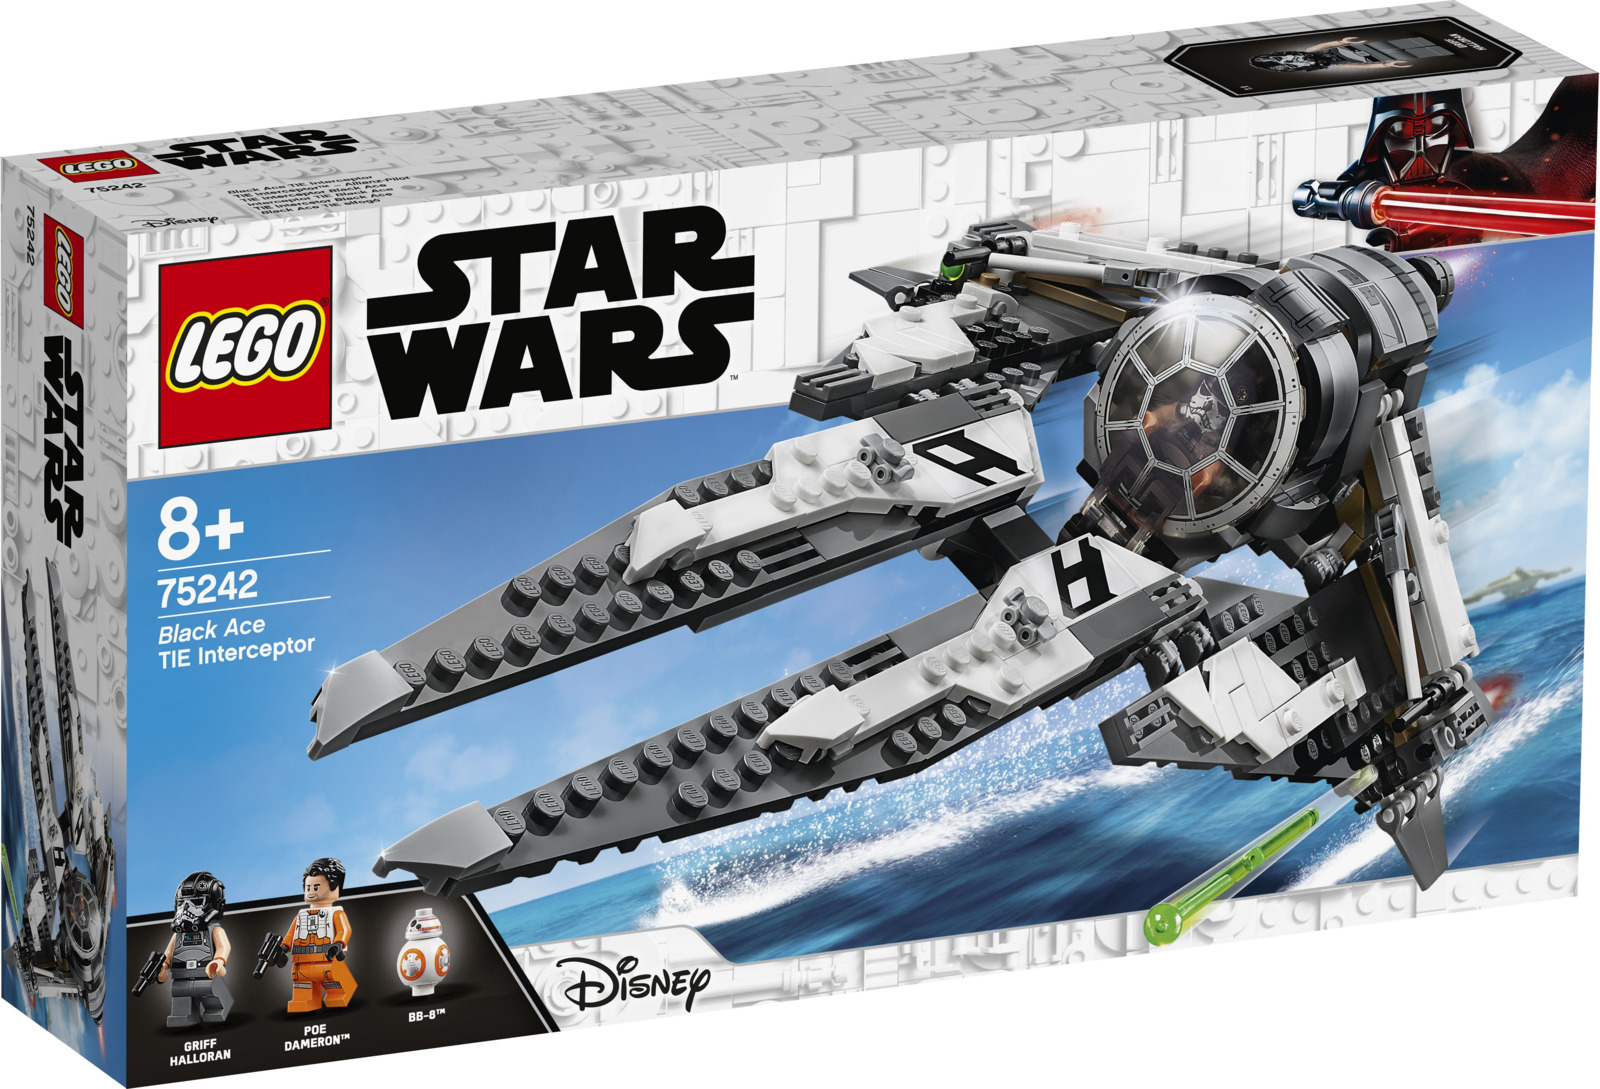 LEGO Star Wars 75242 Перехватчик СИД Черного аса Конструктор